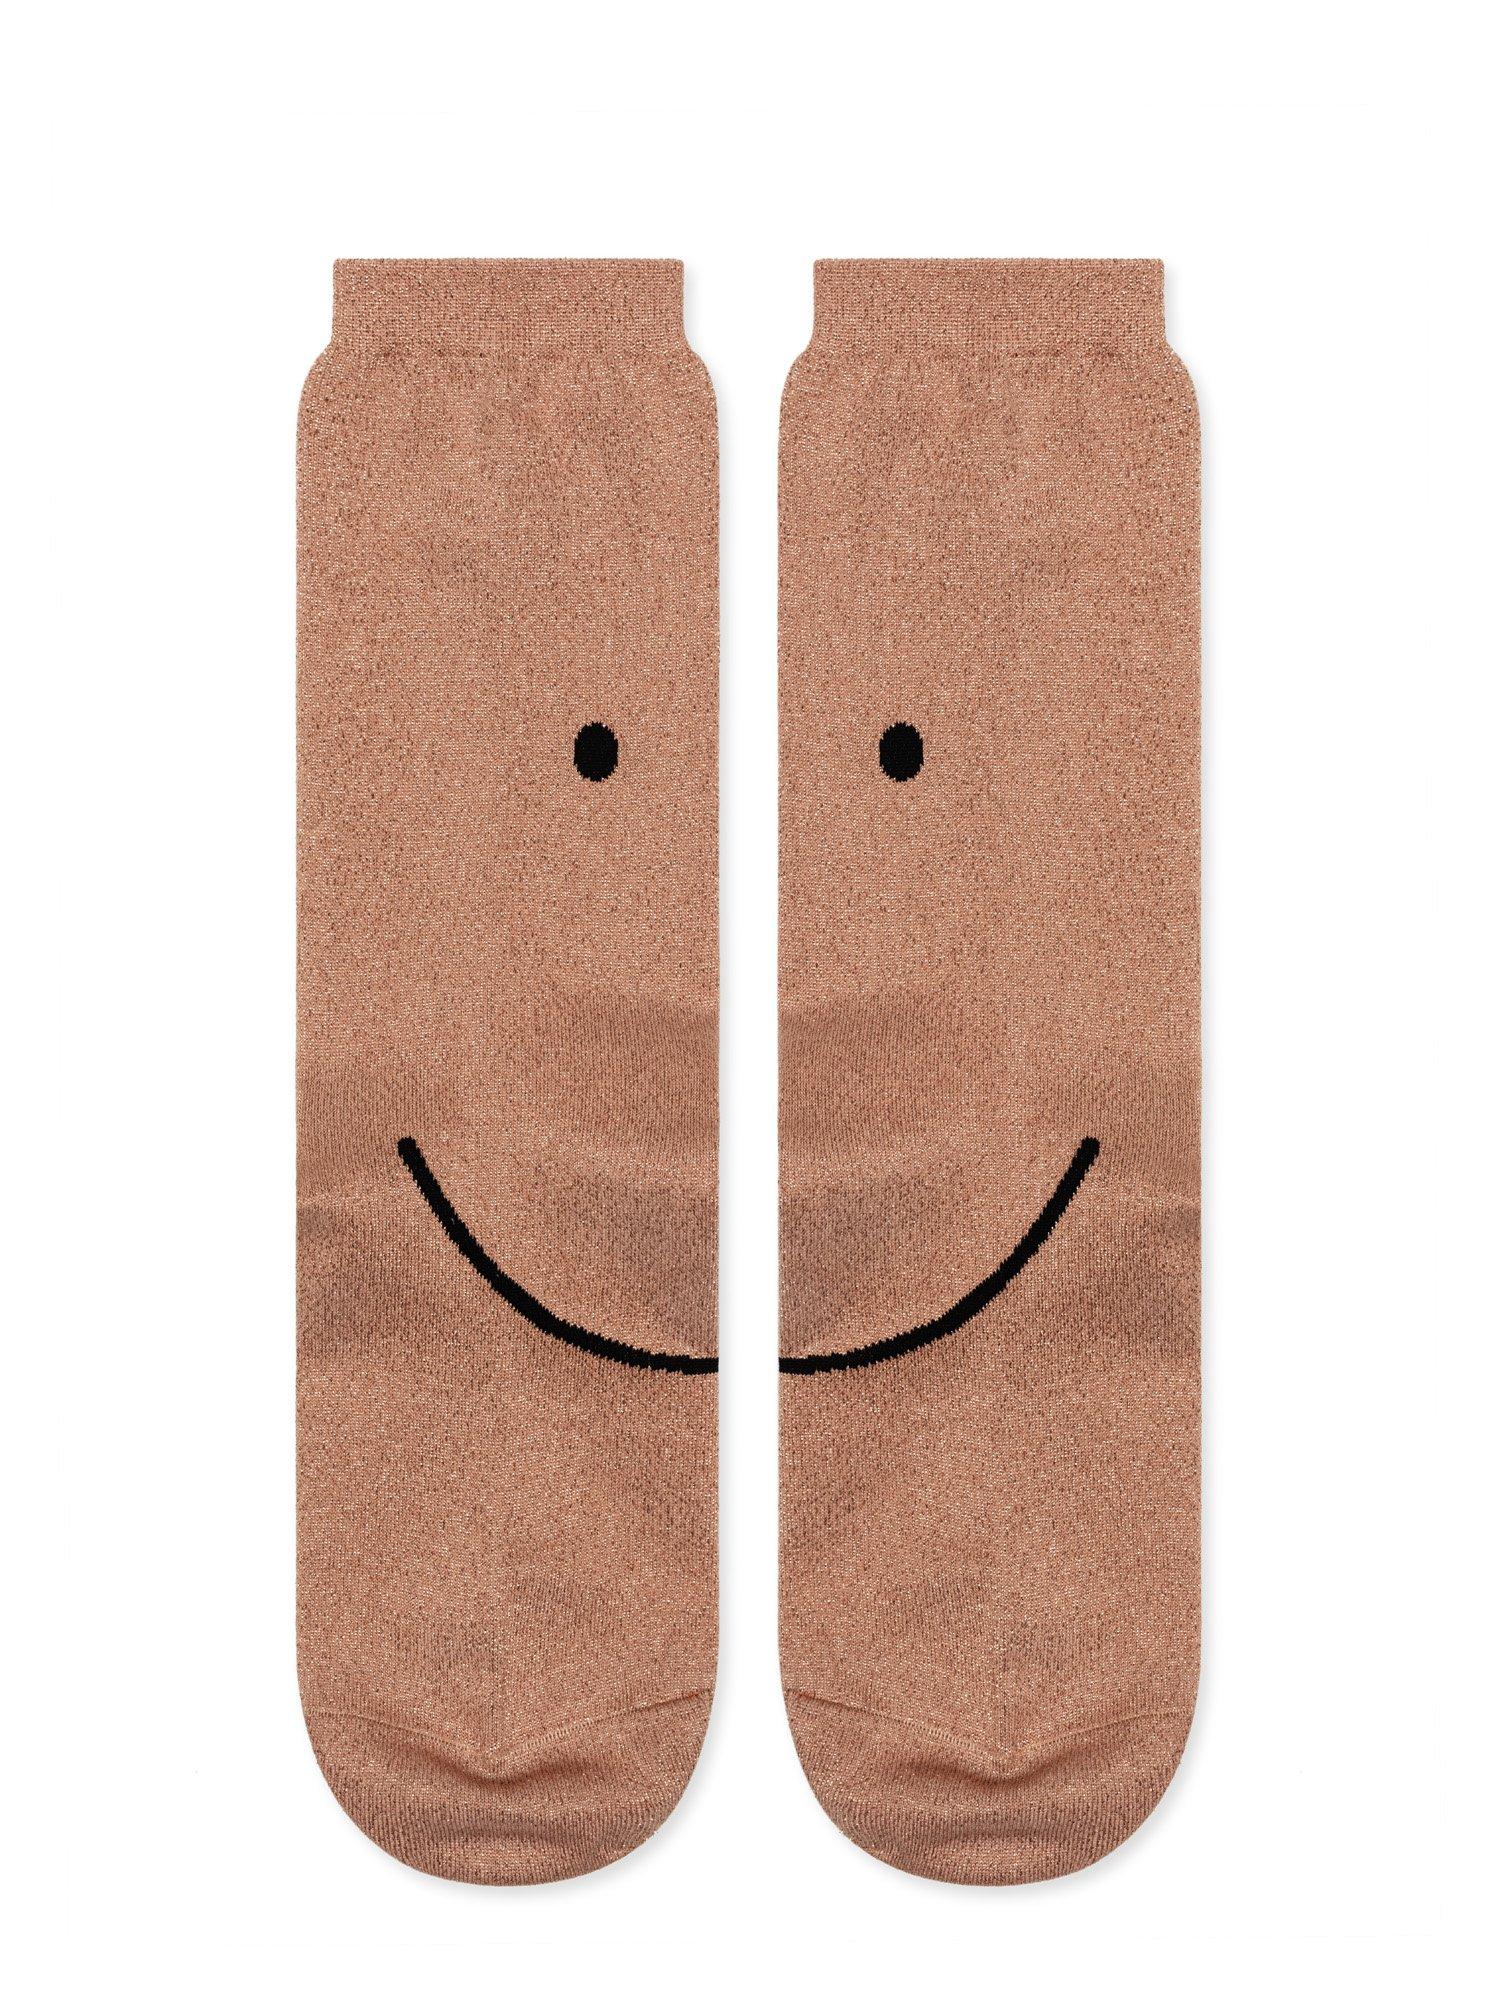 Smiley metallic crew socks by  Hansel from Basel .